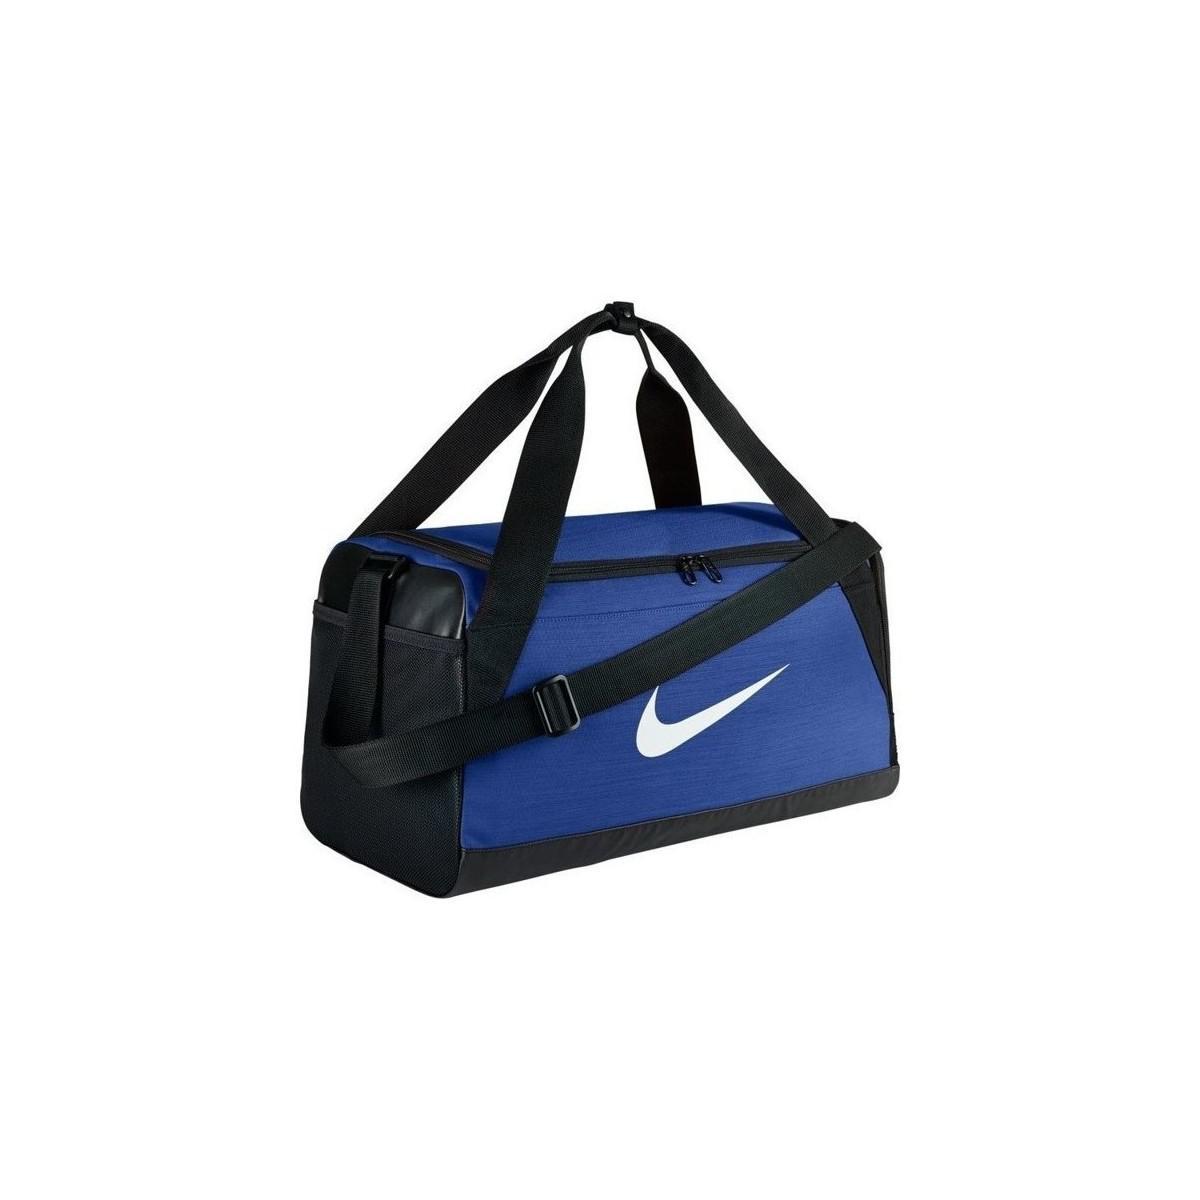 c4549b3ef783 Nike Rasilia 8 X-small Duffle Bag in Blue for Men - Lyst